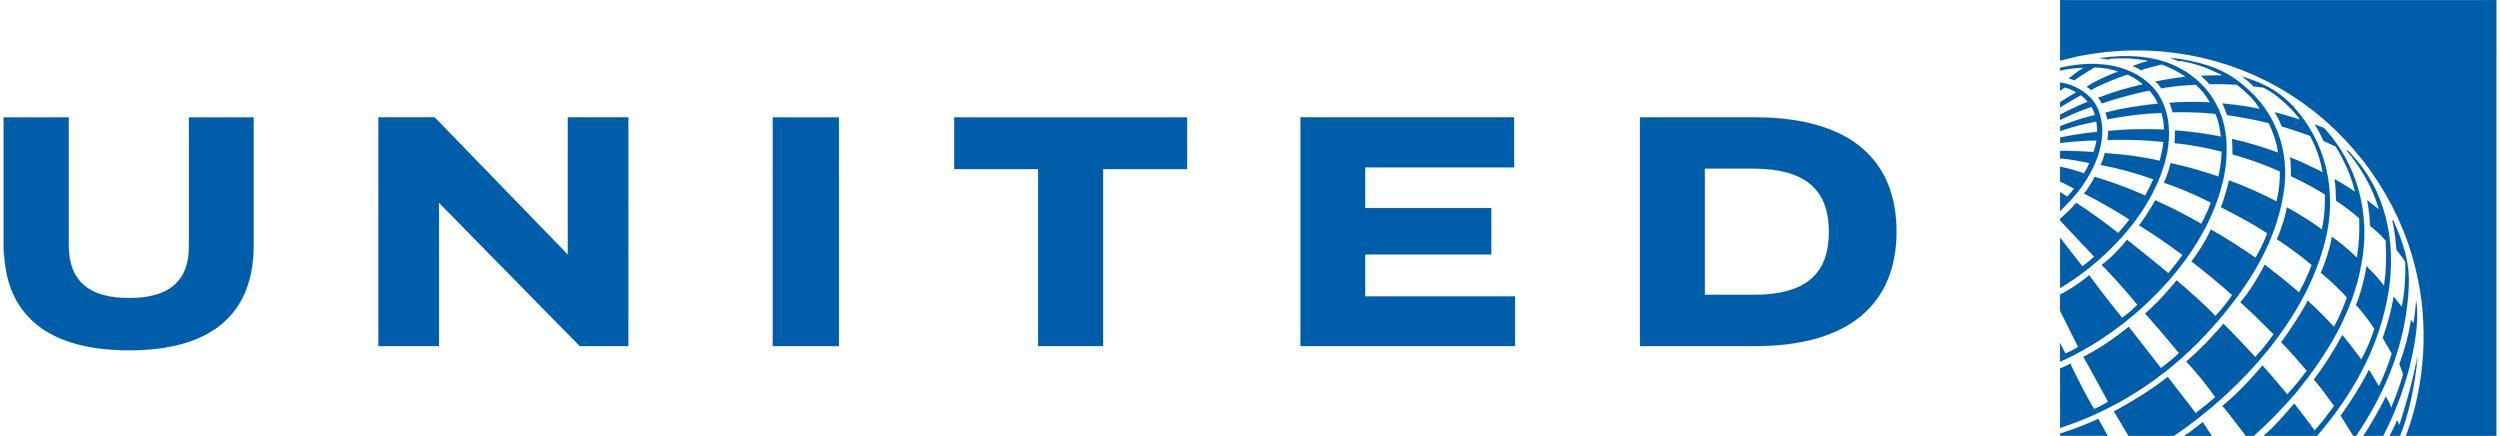 United logo post-2010